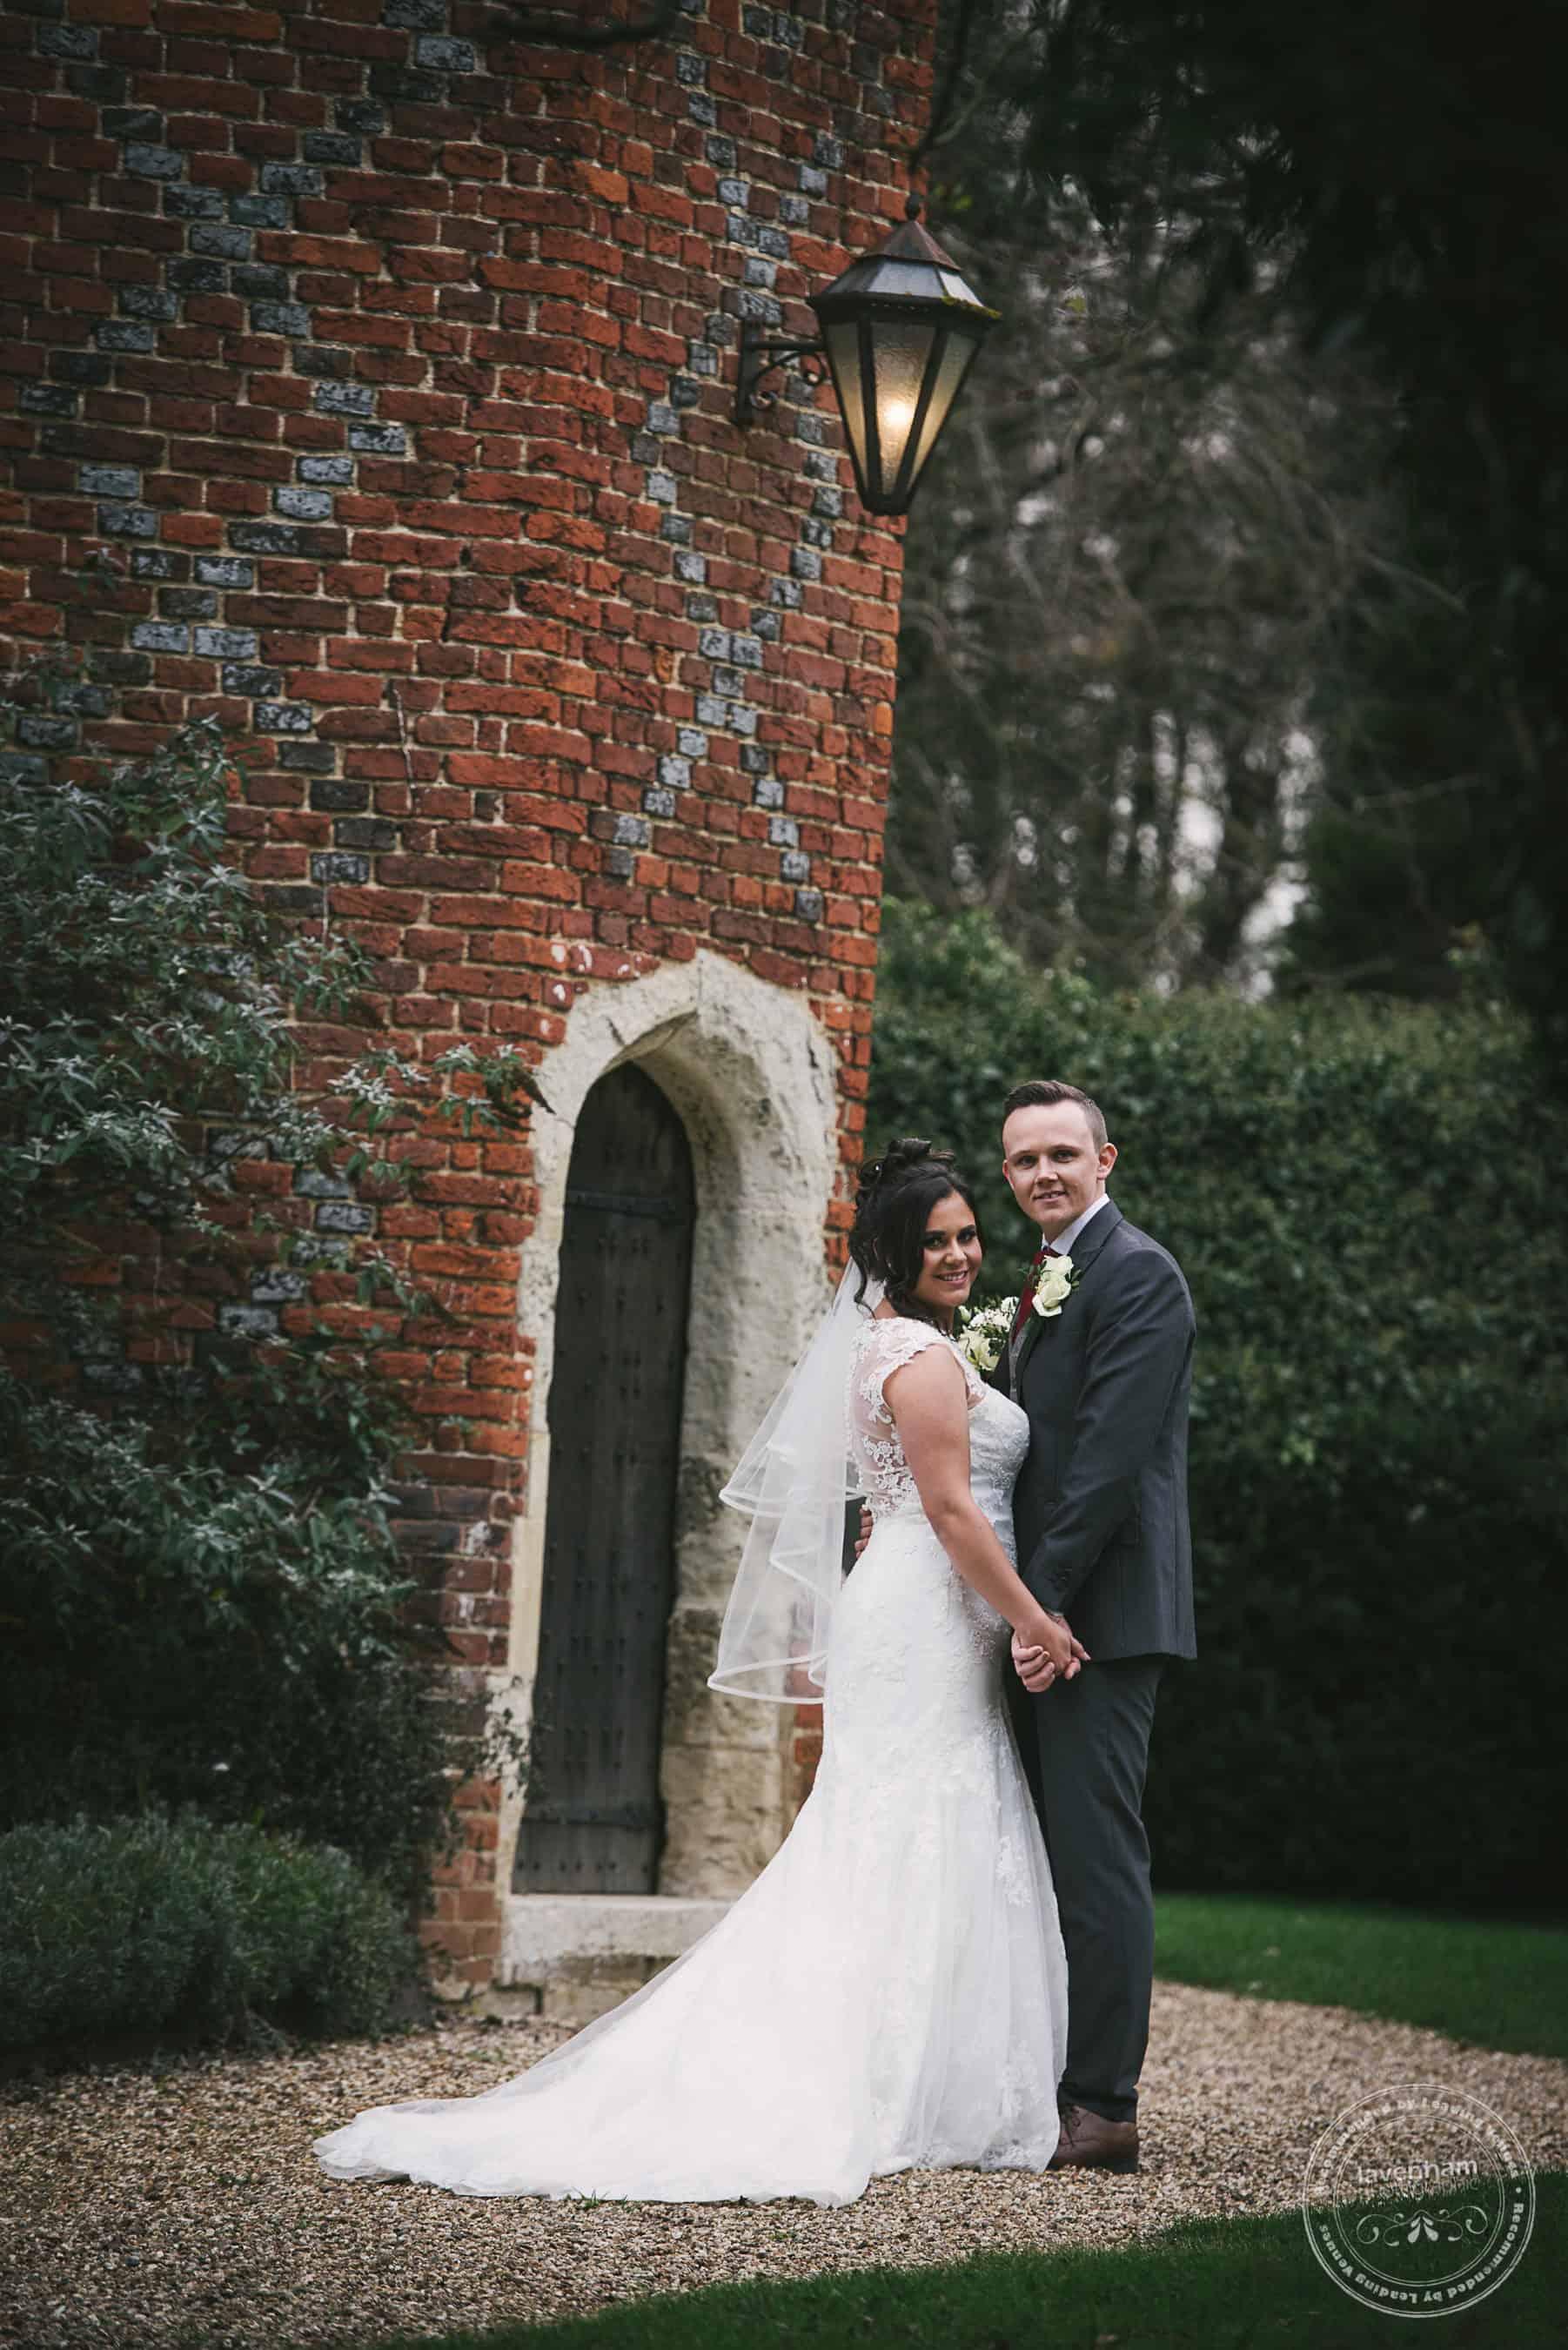 251118 Leez Priory Wedding Photography by Lavenham Photographic 081